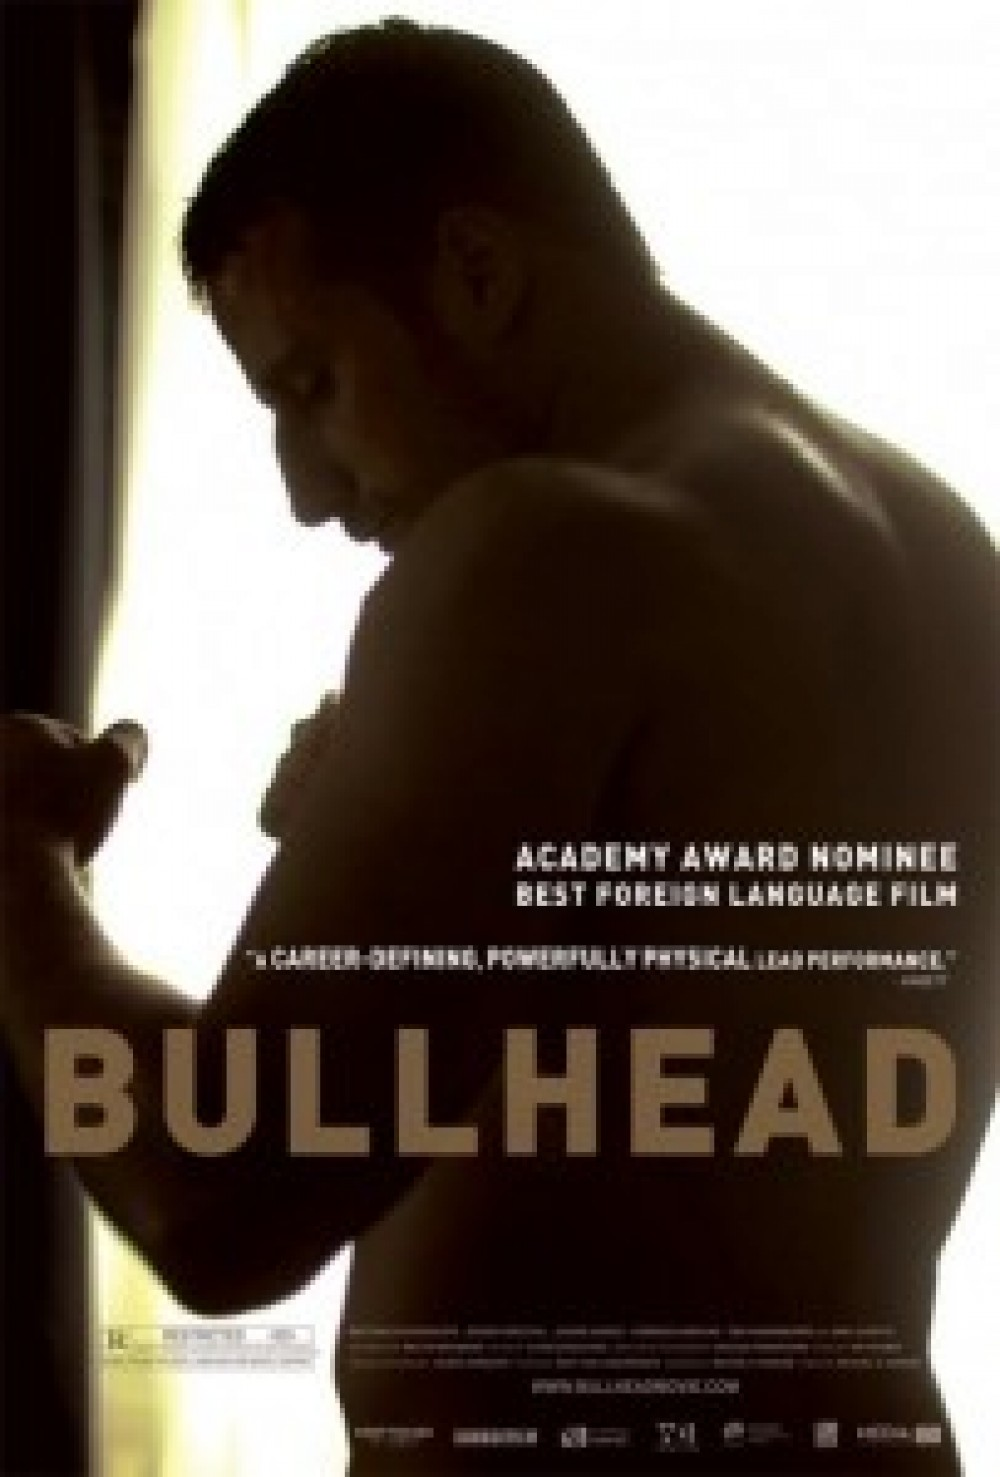 bullhead-movie-poster-2-small.jpg